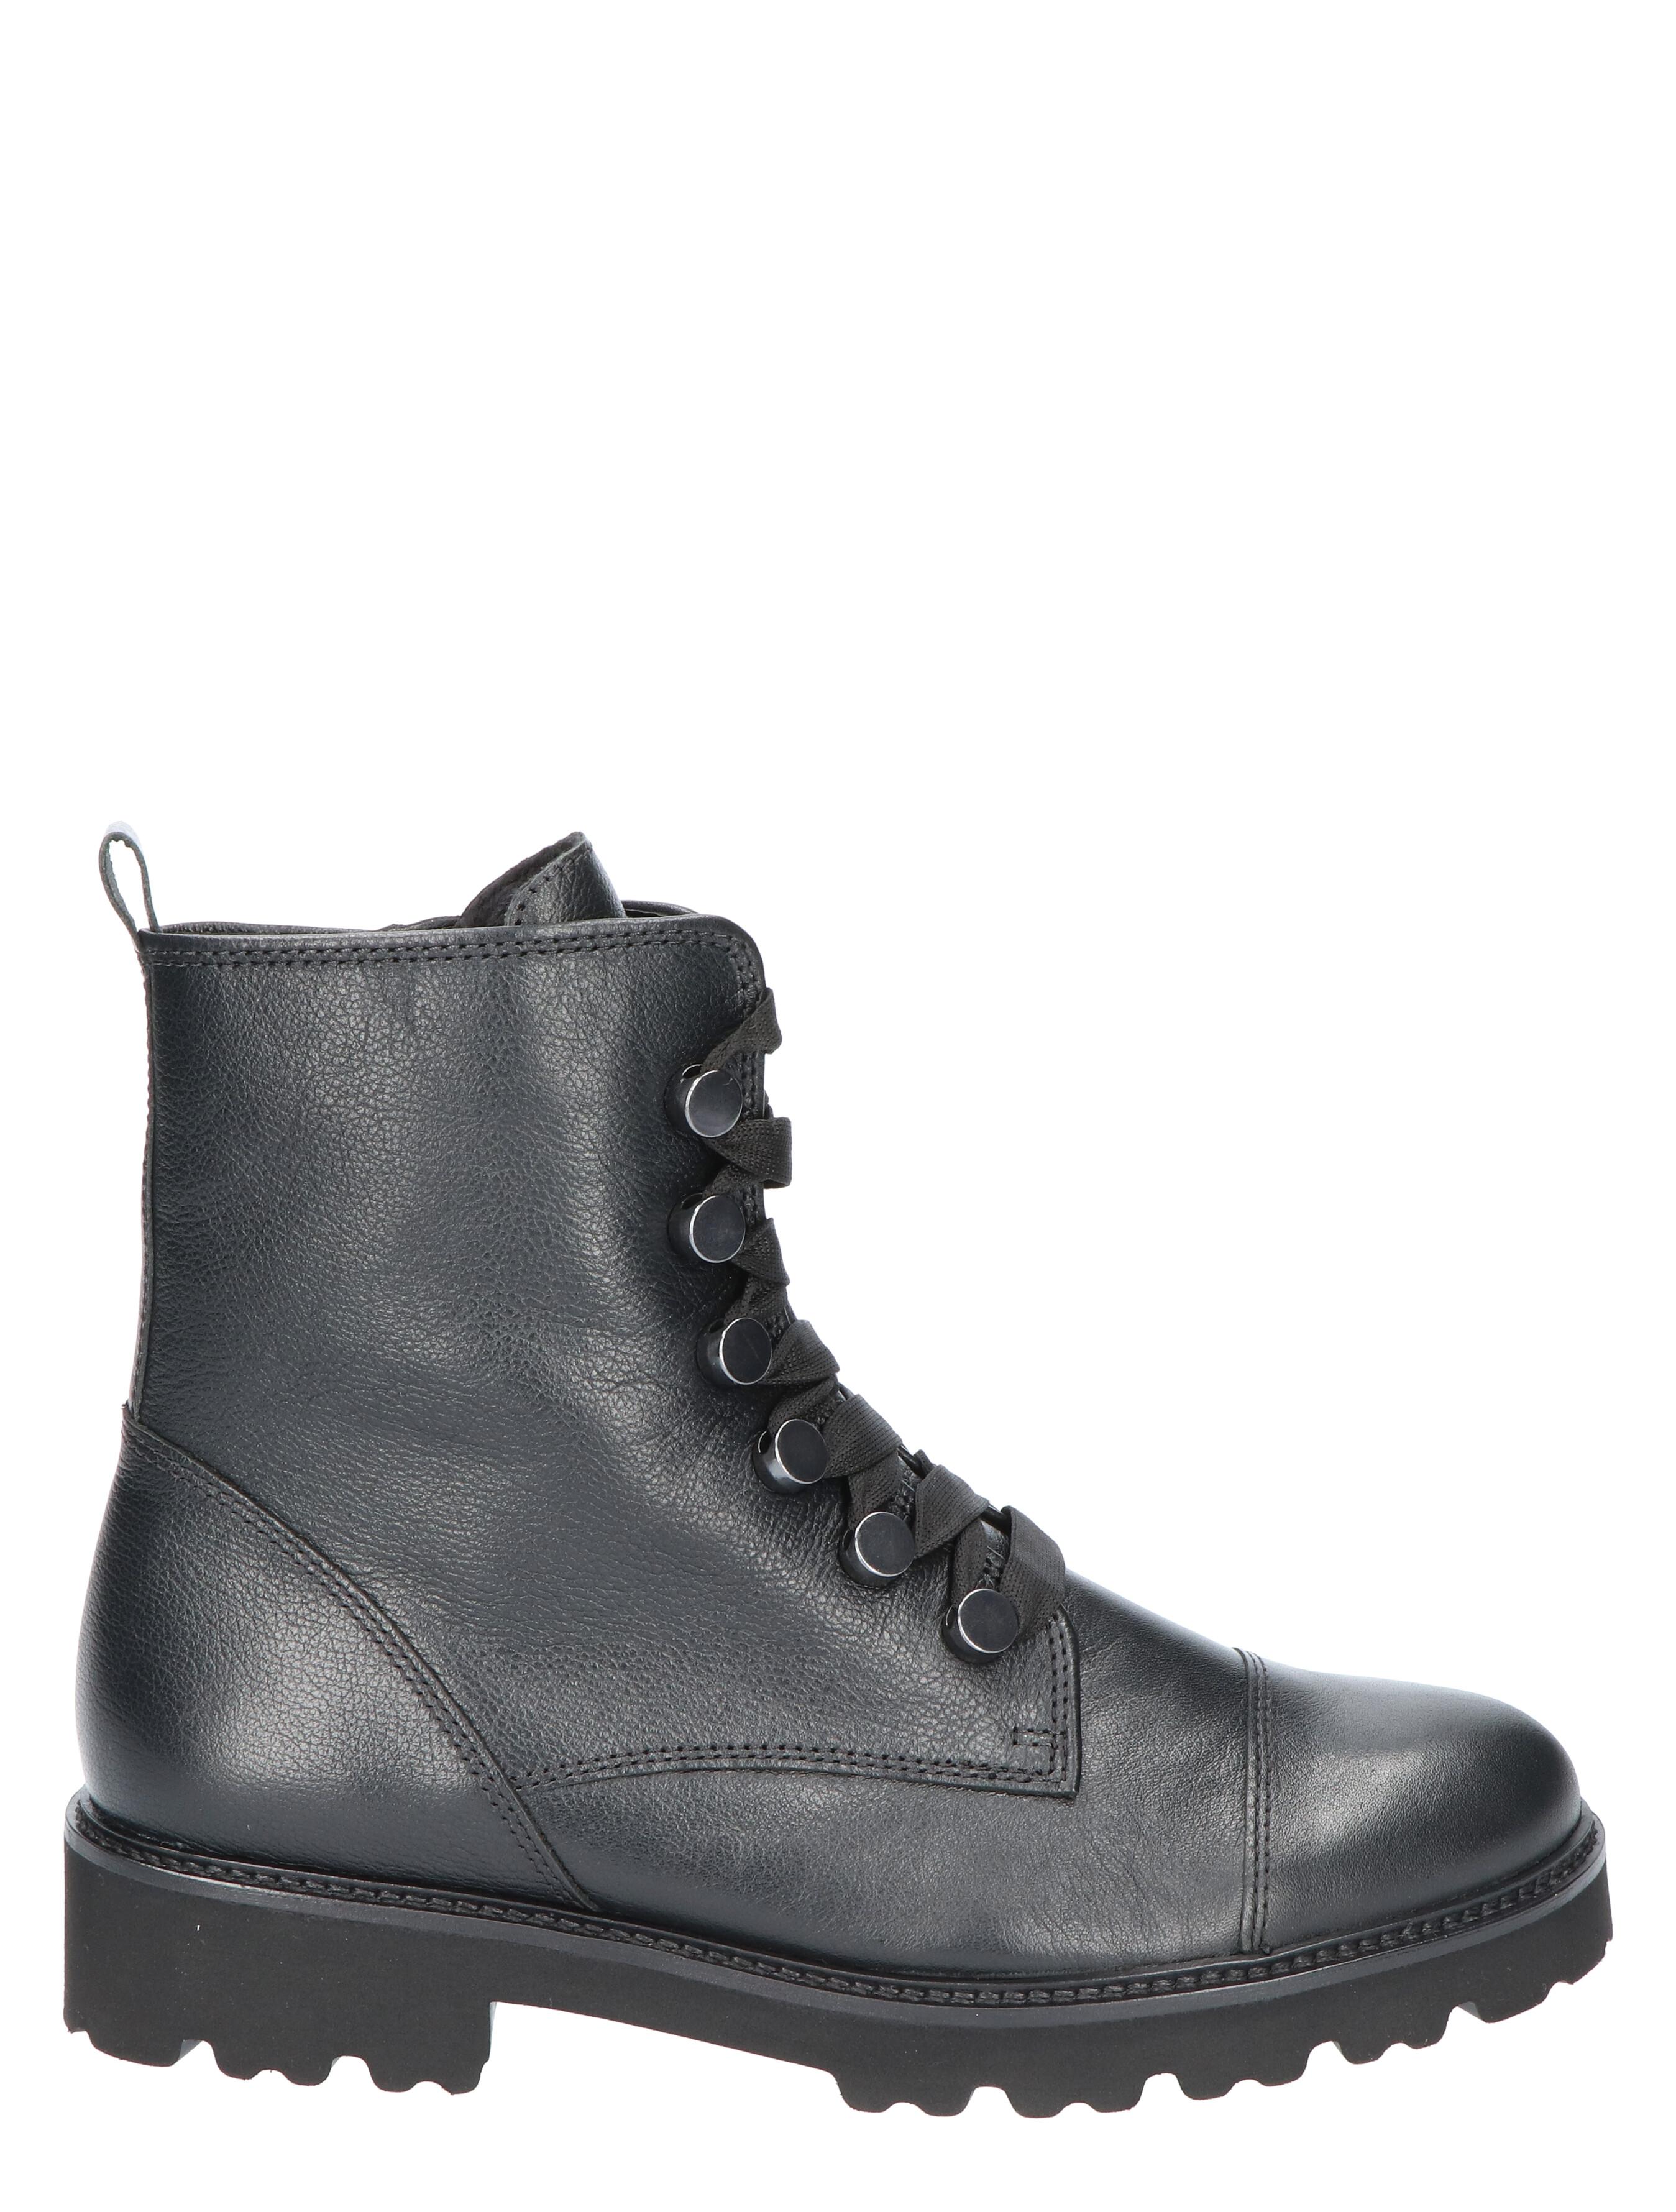 Gabor 51.801 Black G-Wijdte Boots